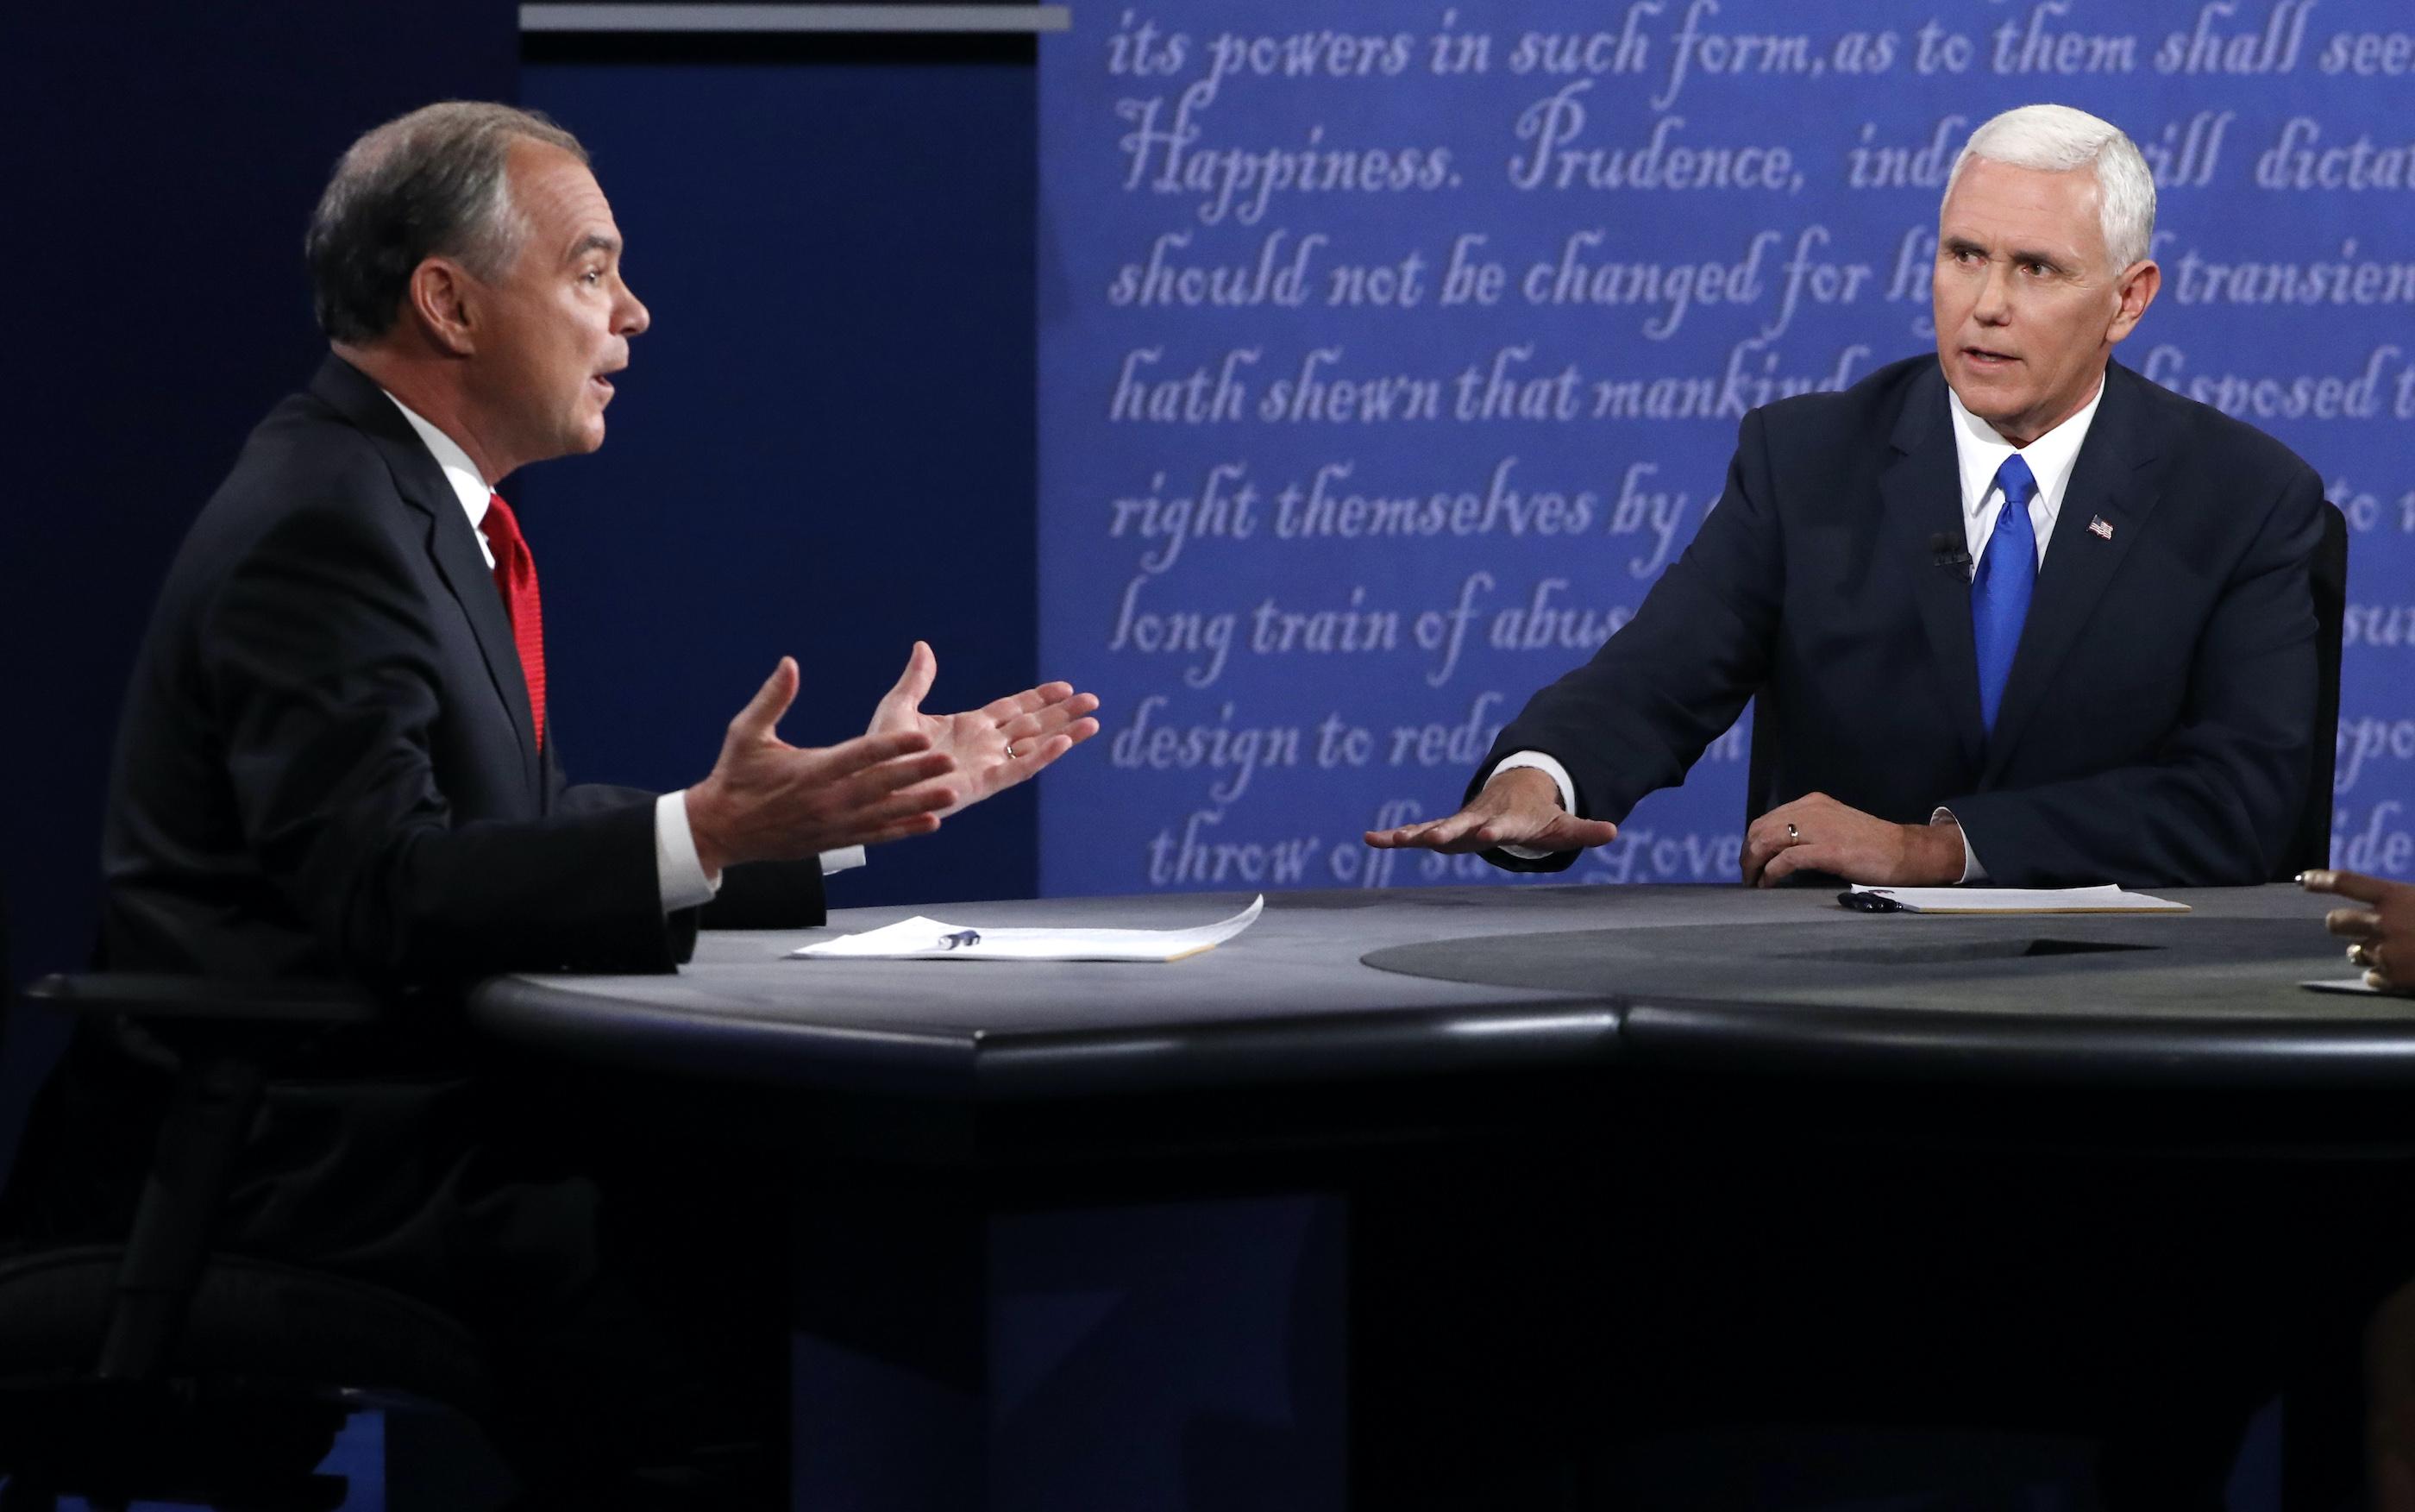 Kaine vs. Pence: The 2016 vice presidential debate